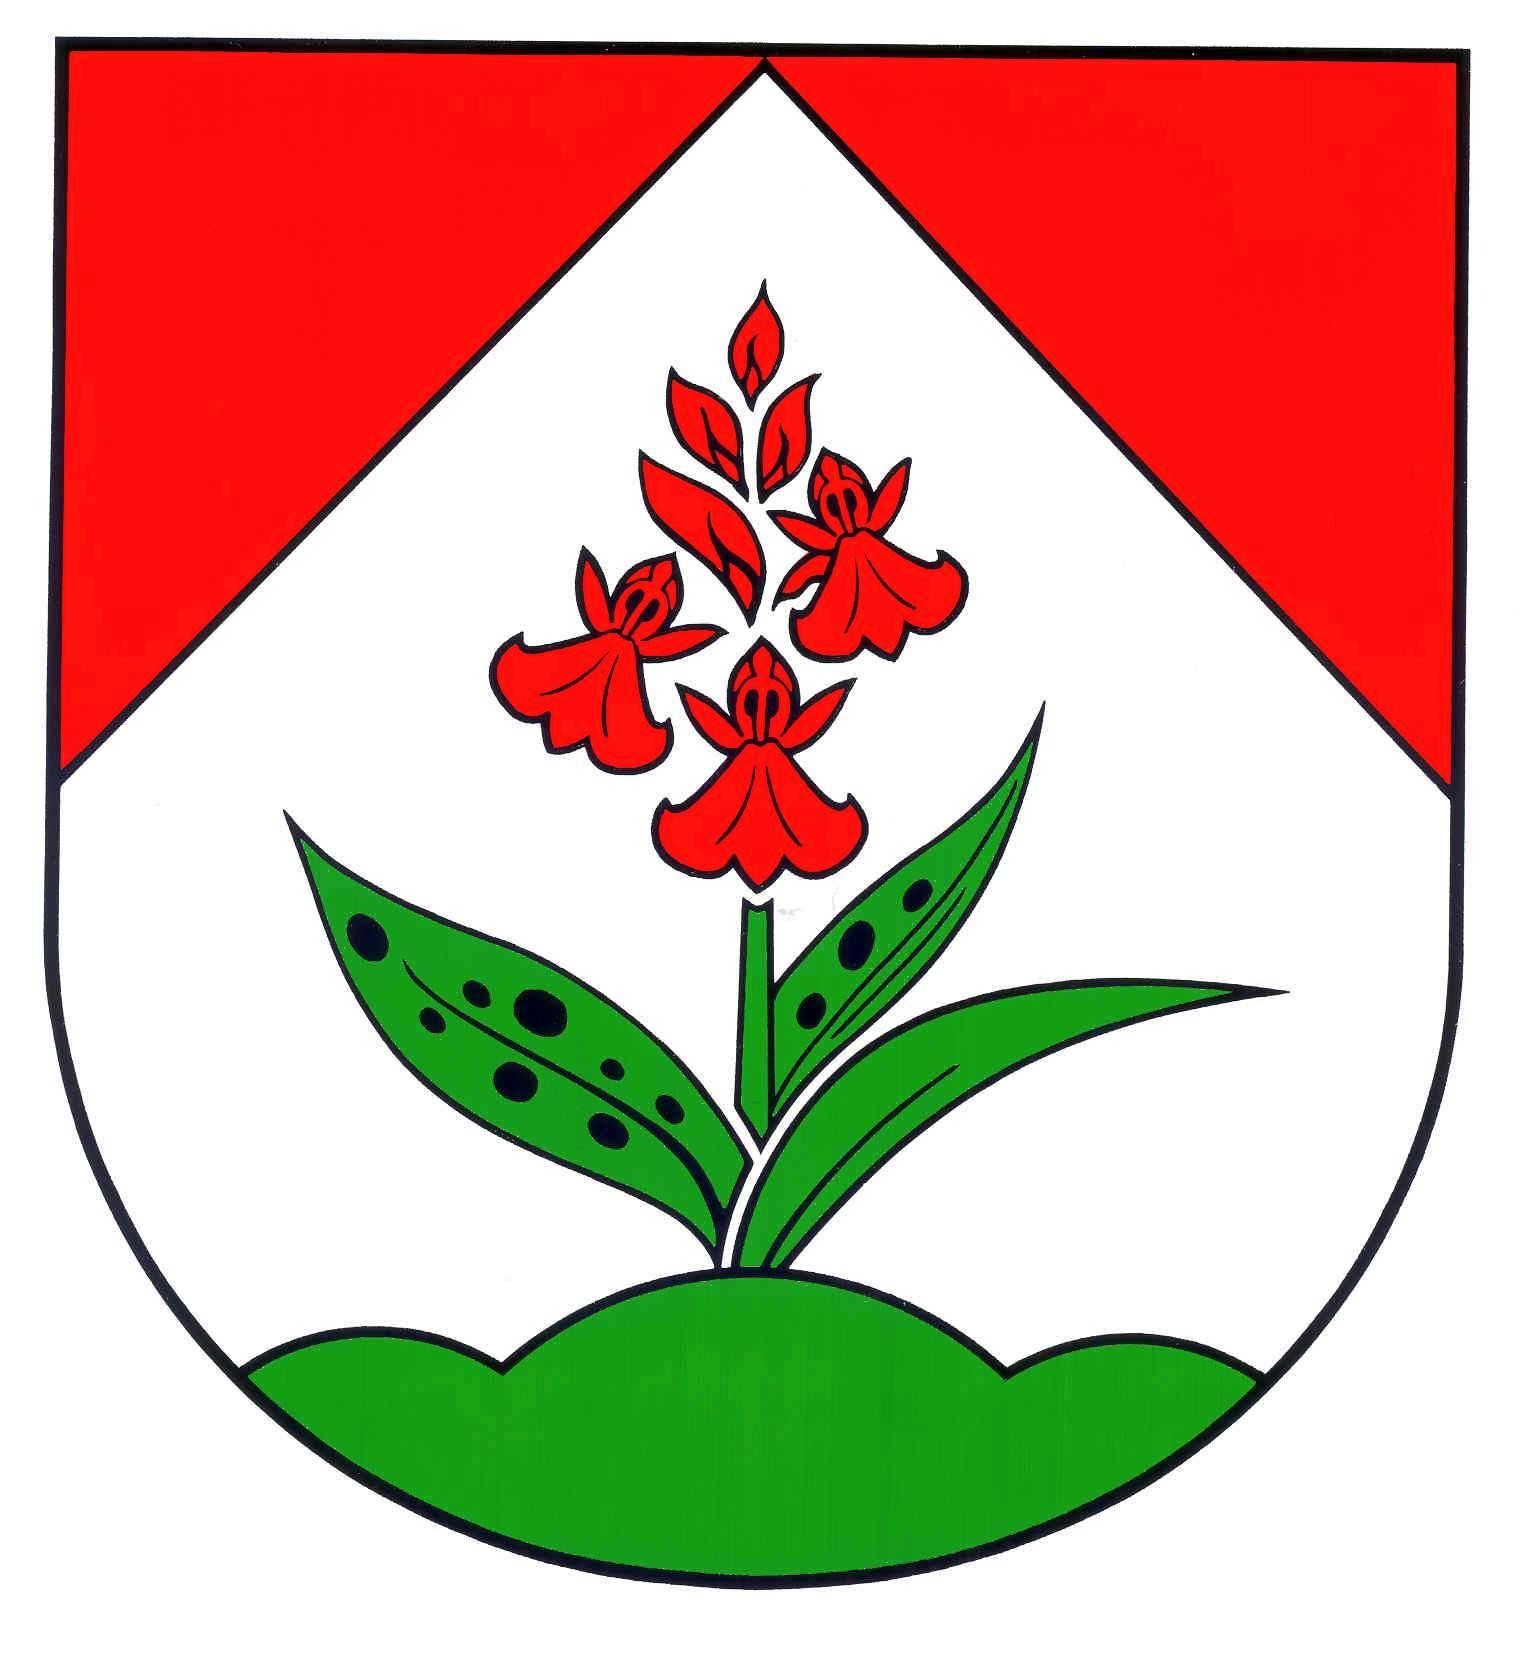 Wappen GemeindeHüttblek, Kreis Segeberg